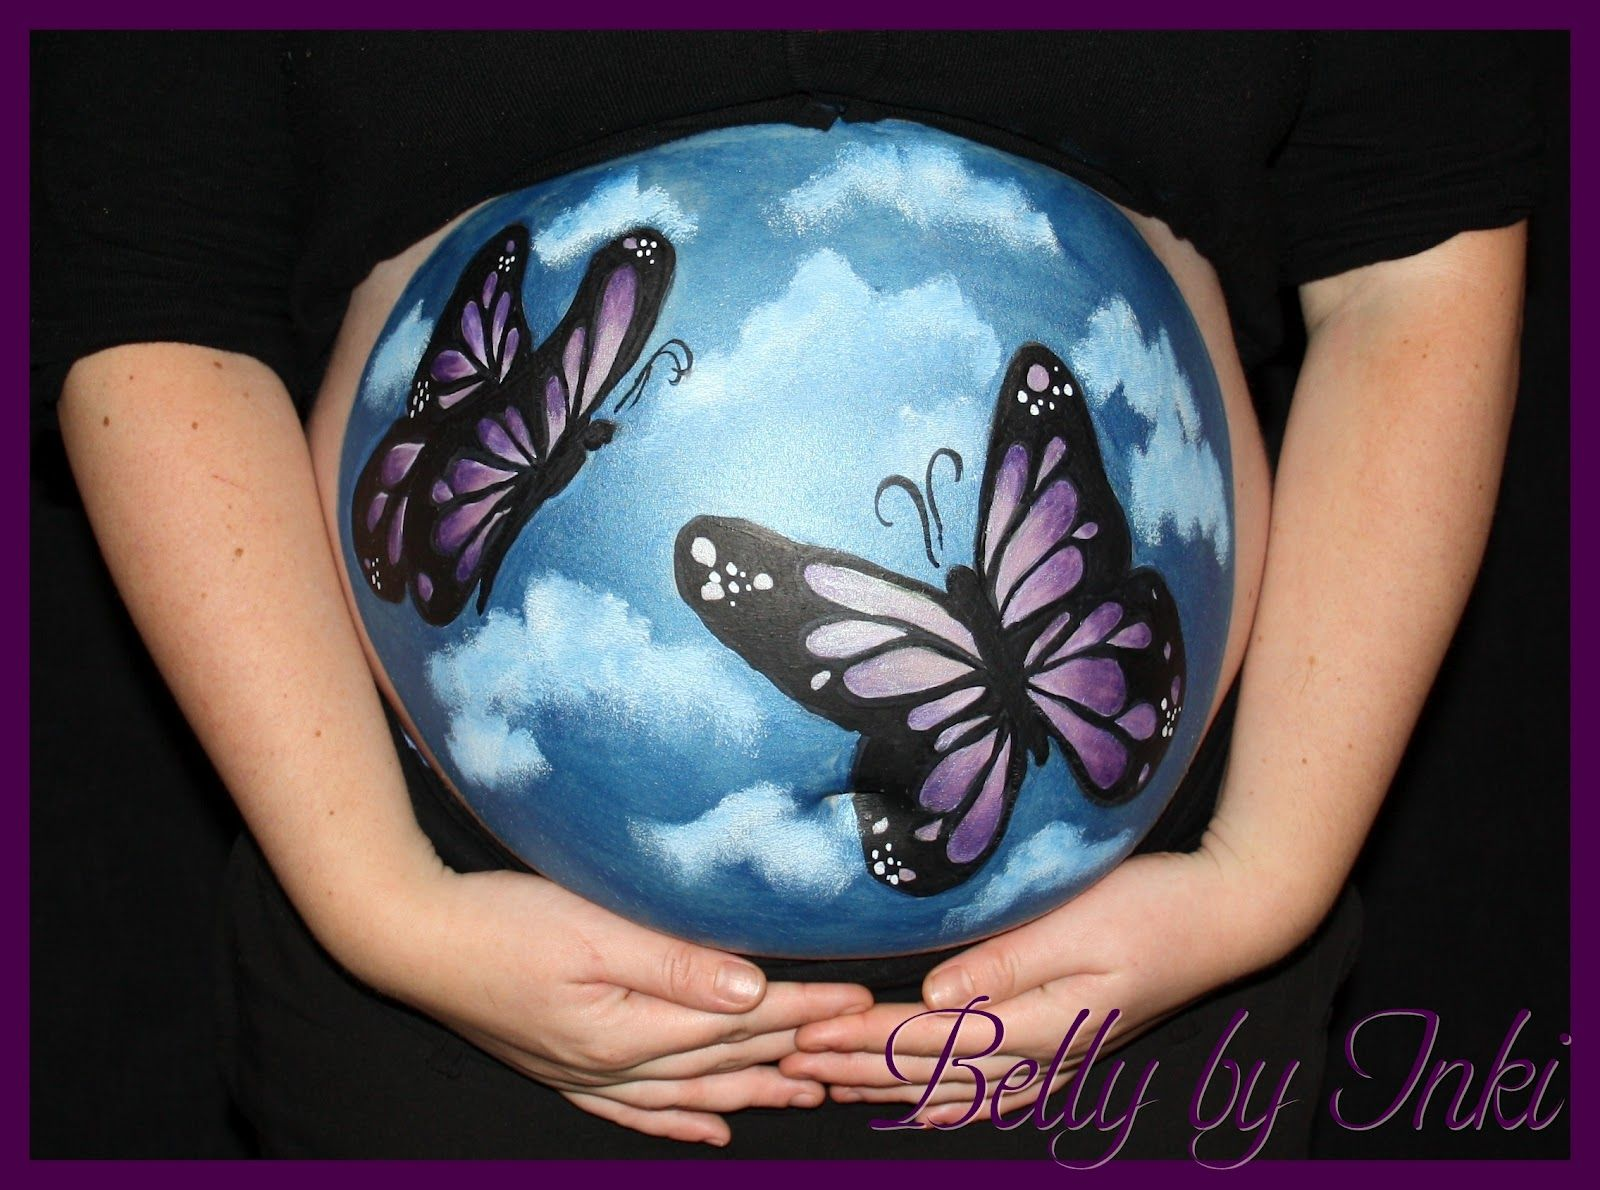 butterfly bellypaint prenatal belly painting pinterest babybauch fotos und ideen. Black Bedroom Furniture Sets. Home Design Ideas